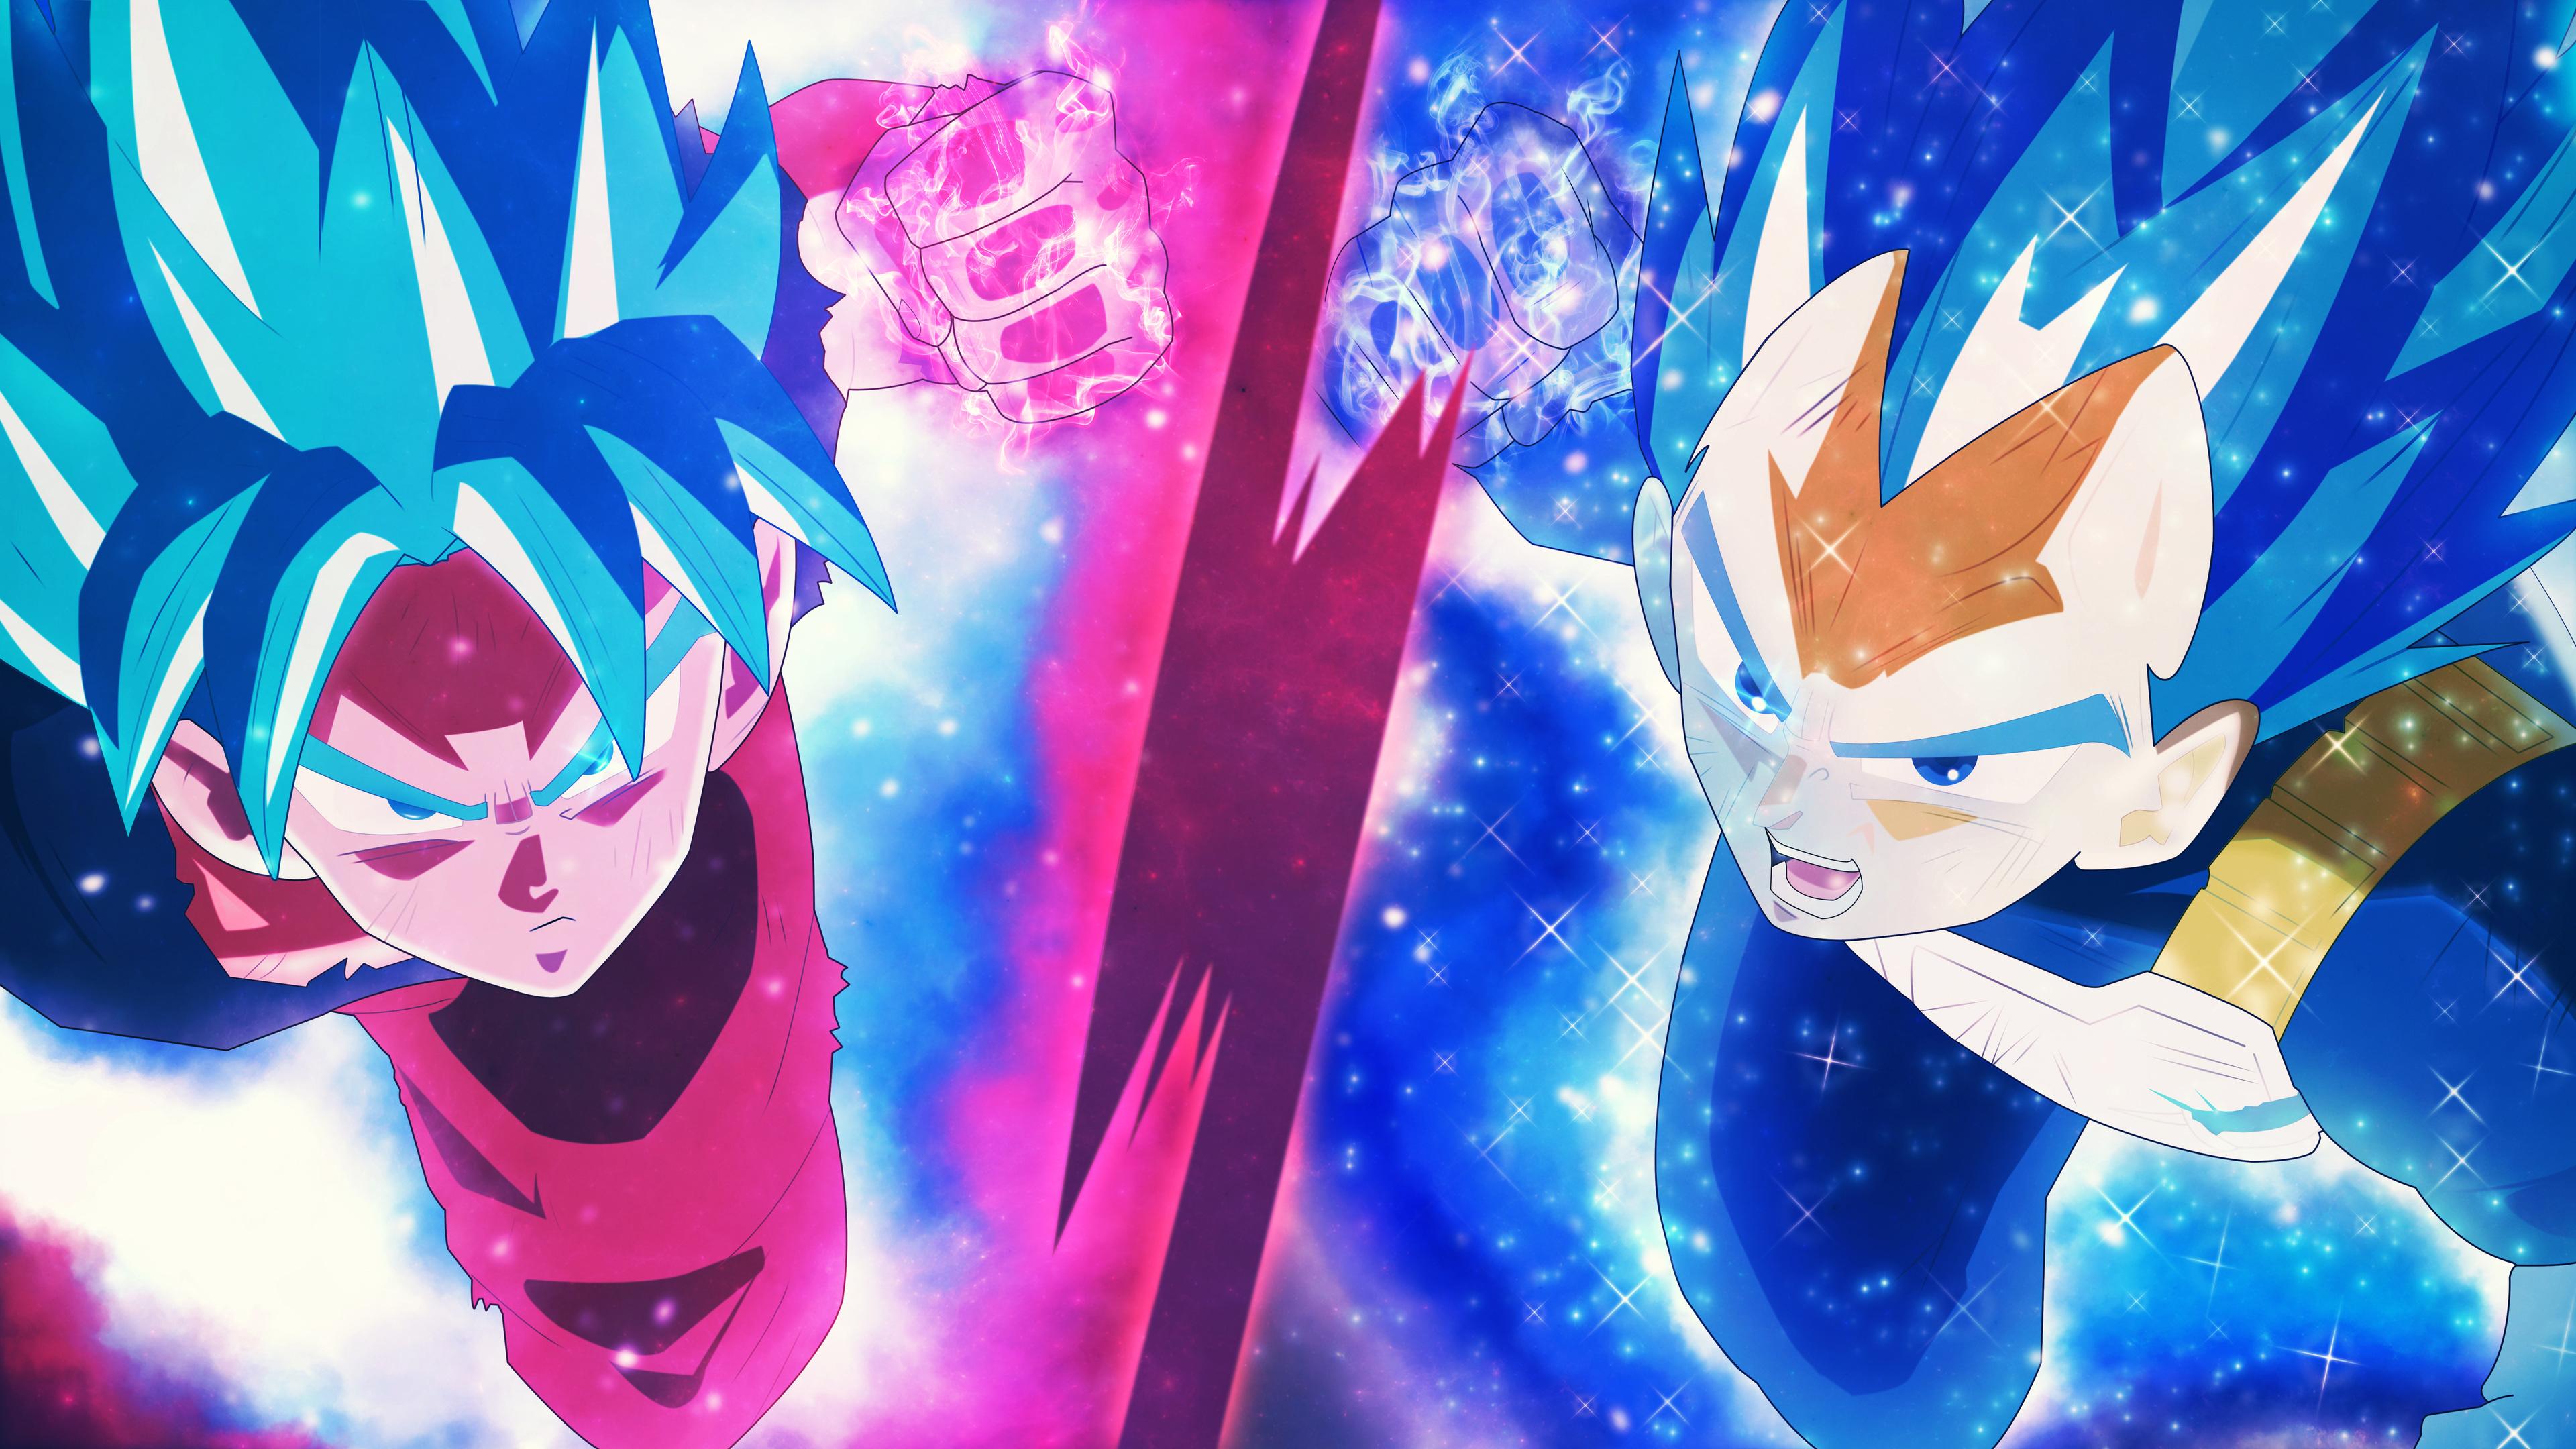 dragon ball super super saiyan blue 4k 1541974167 - Dragon Ball Super Super Saiyan Blue 4k - hd-wallpapers, dragon ball wallpapers, dragon ball super wallpapers, anime wallpapers, 4k-wallpapers